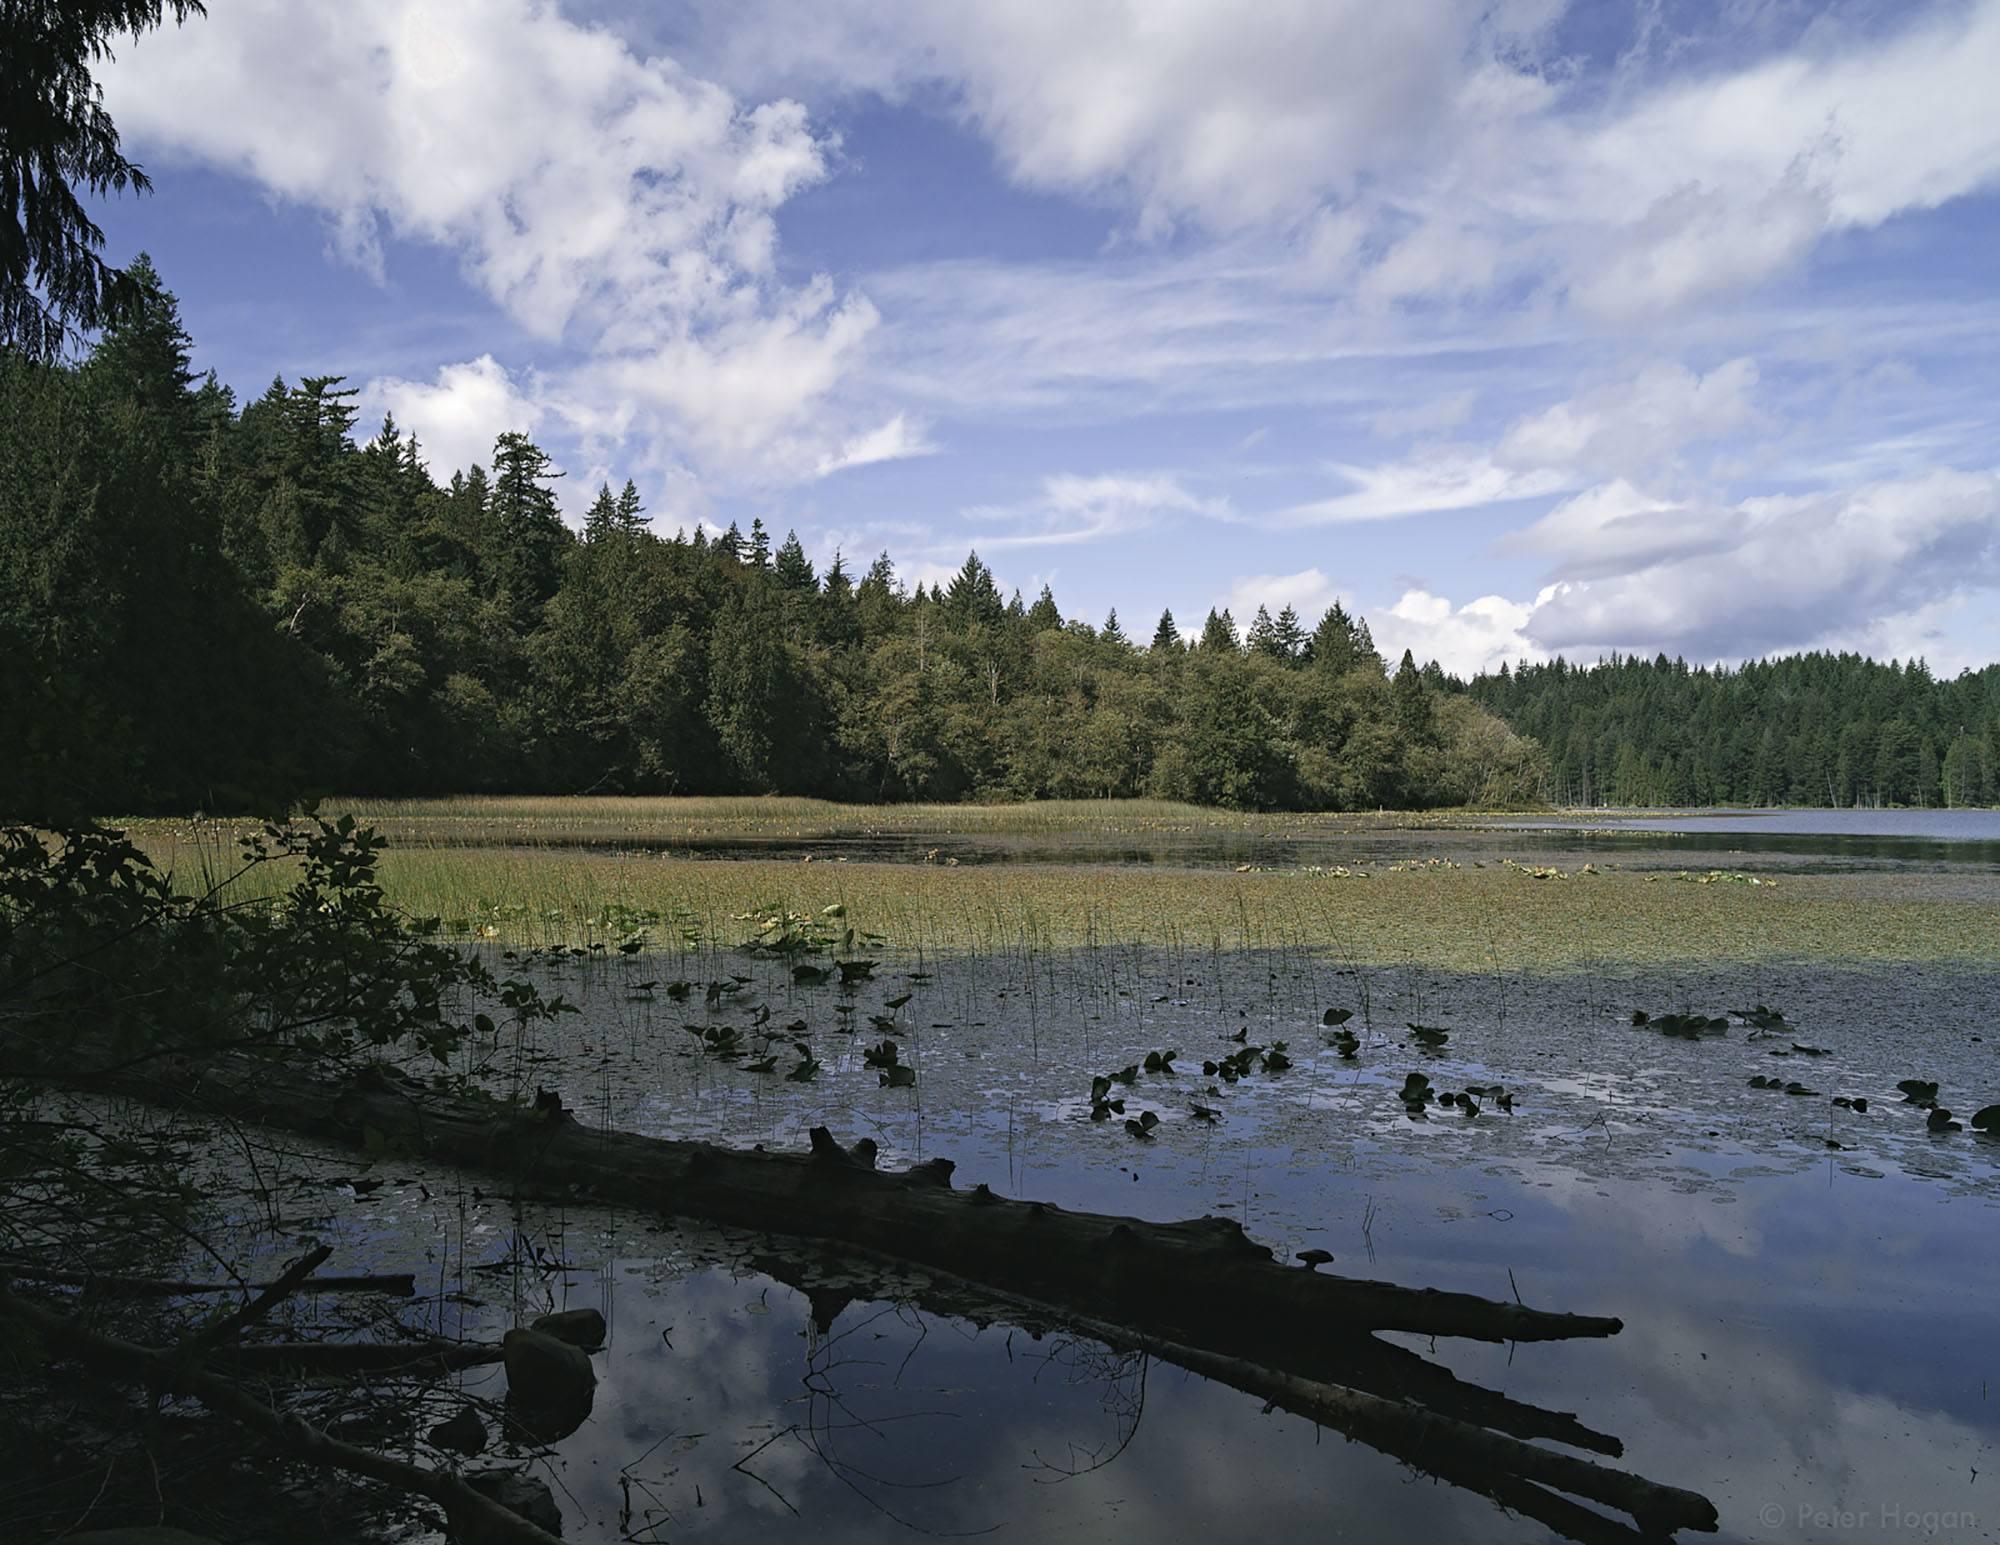 Killarney Lake on Bowen Island, Vancouver (3dpete/Flickr)